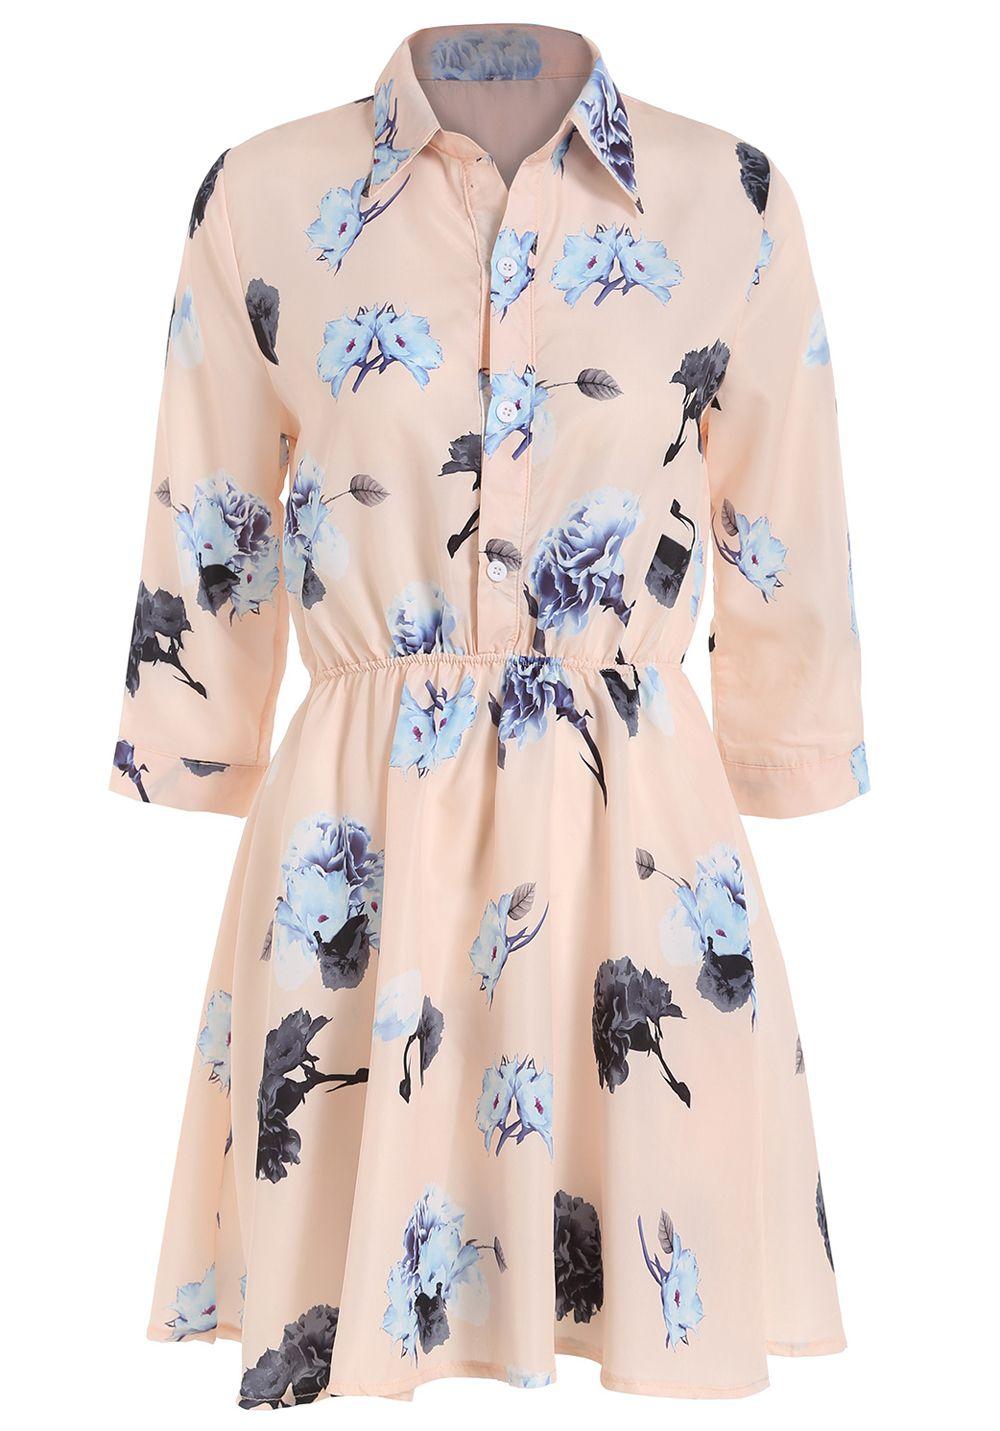 Romwe Lapel Flower Print Shirt Dress Dresses Dresses Shirt